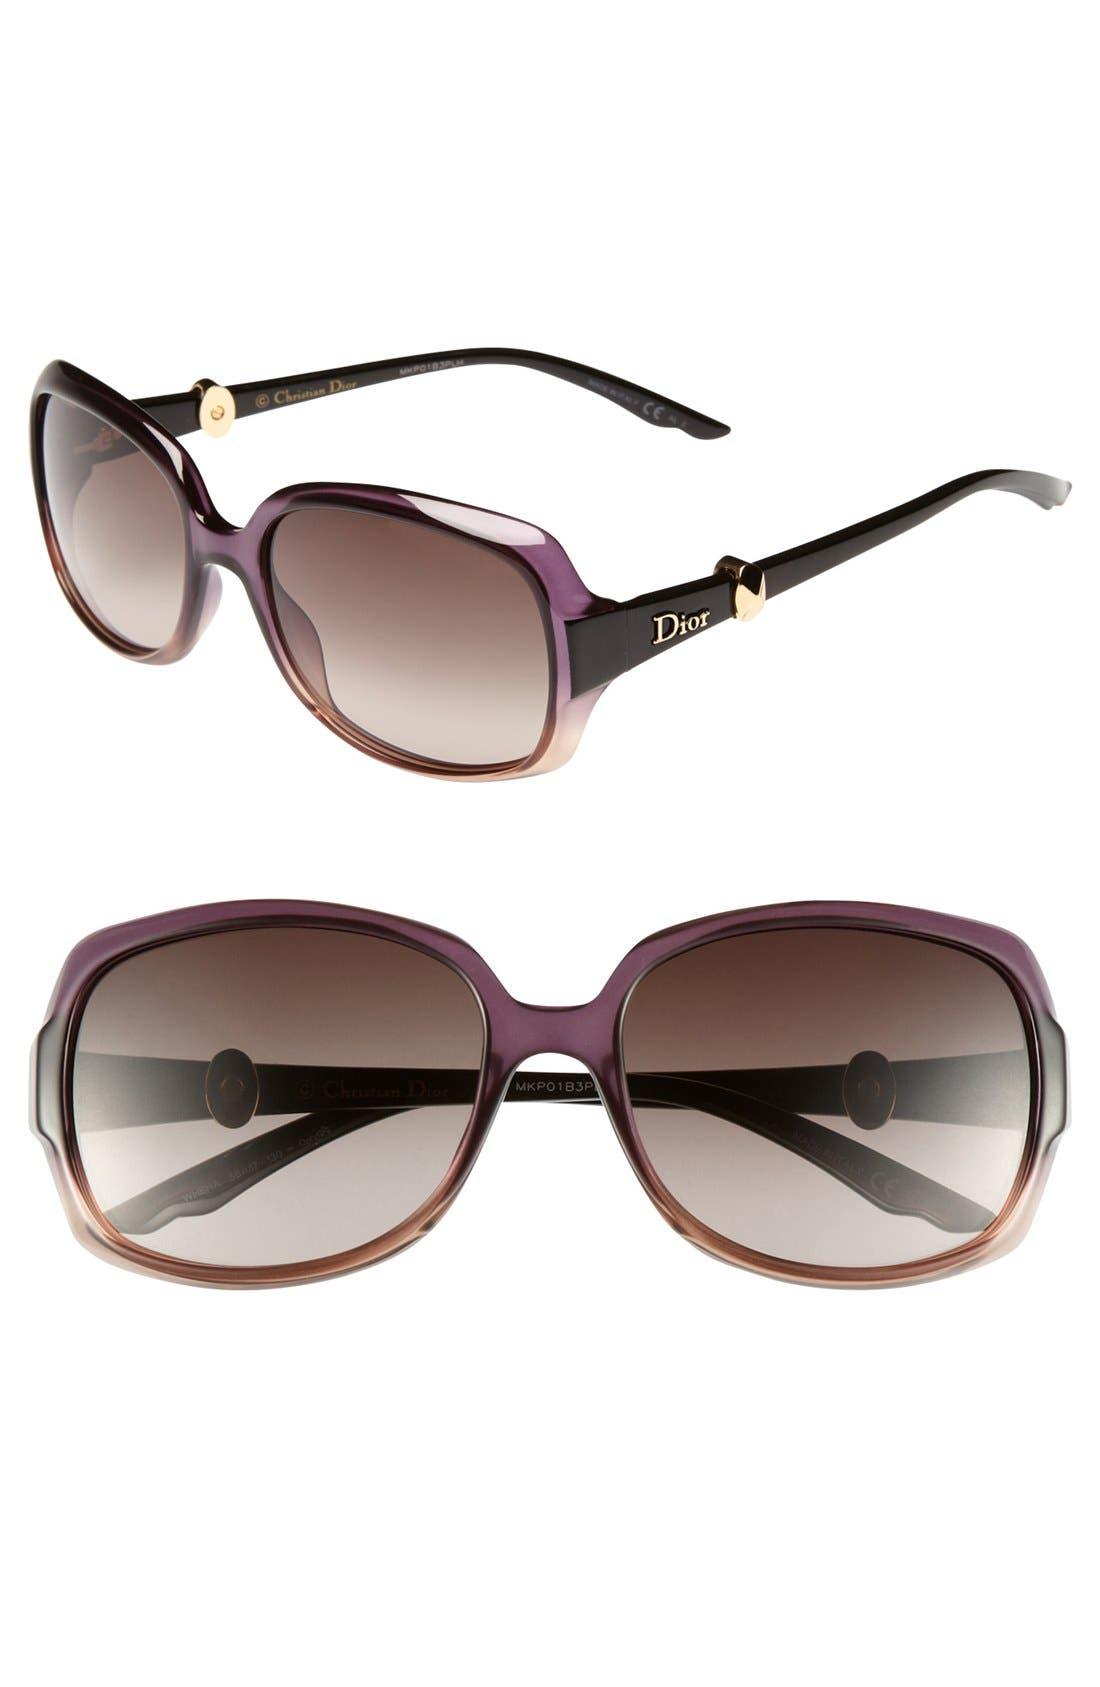 Main Image - Dior 'Mystery 2' 56mm Sunglasses